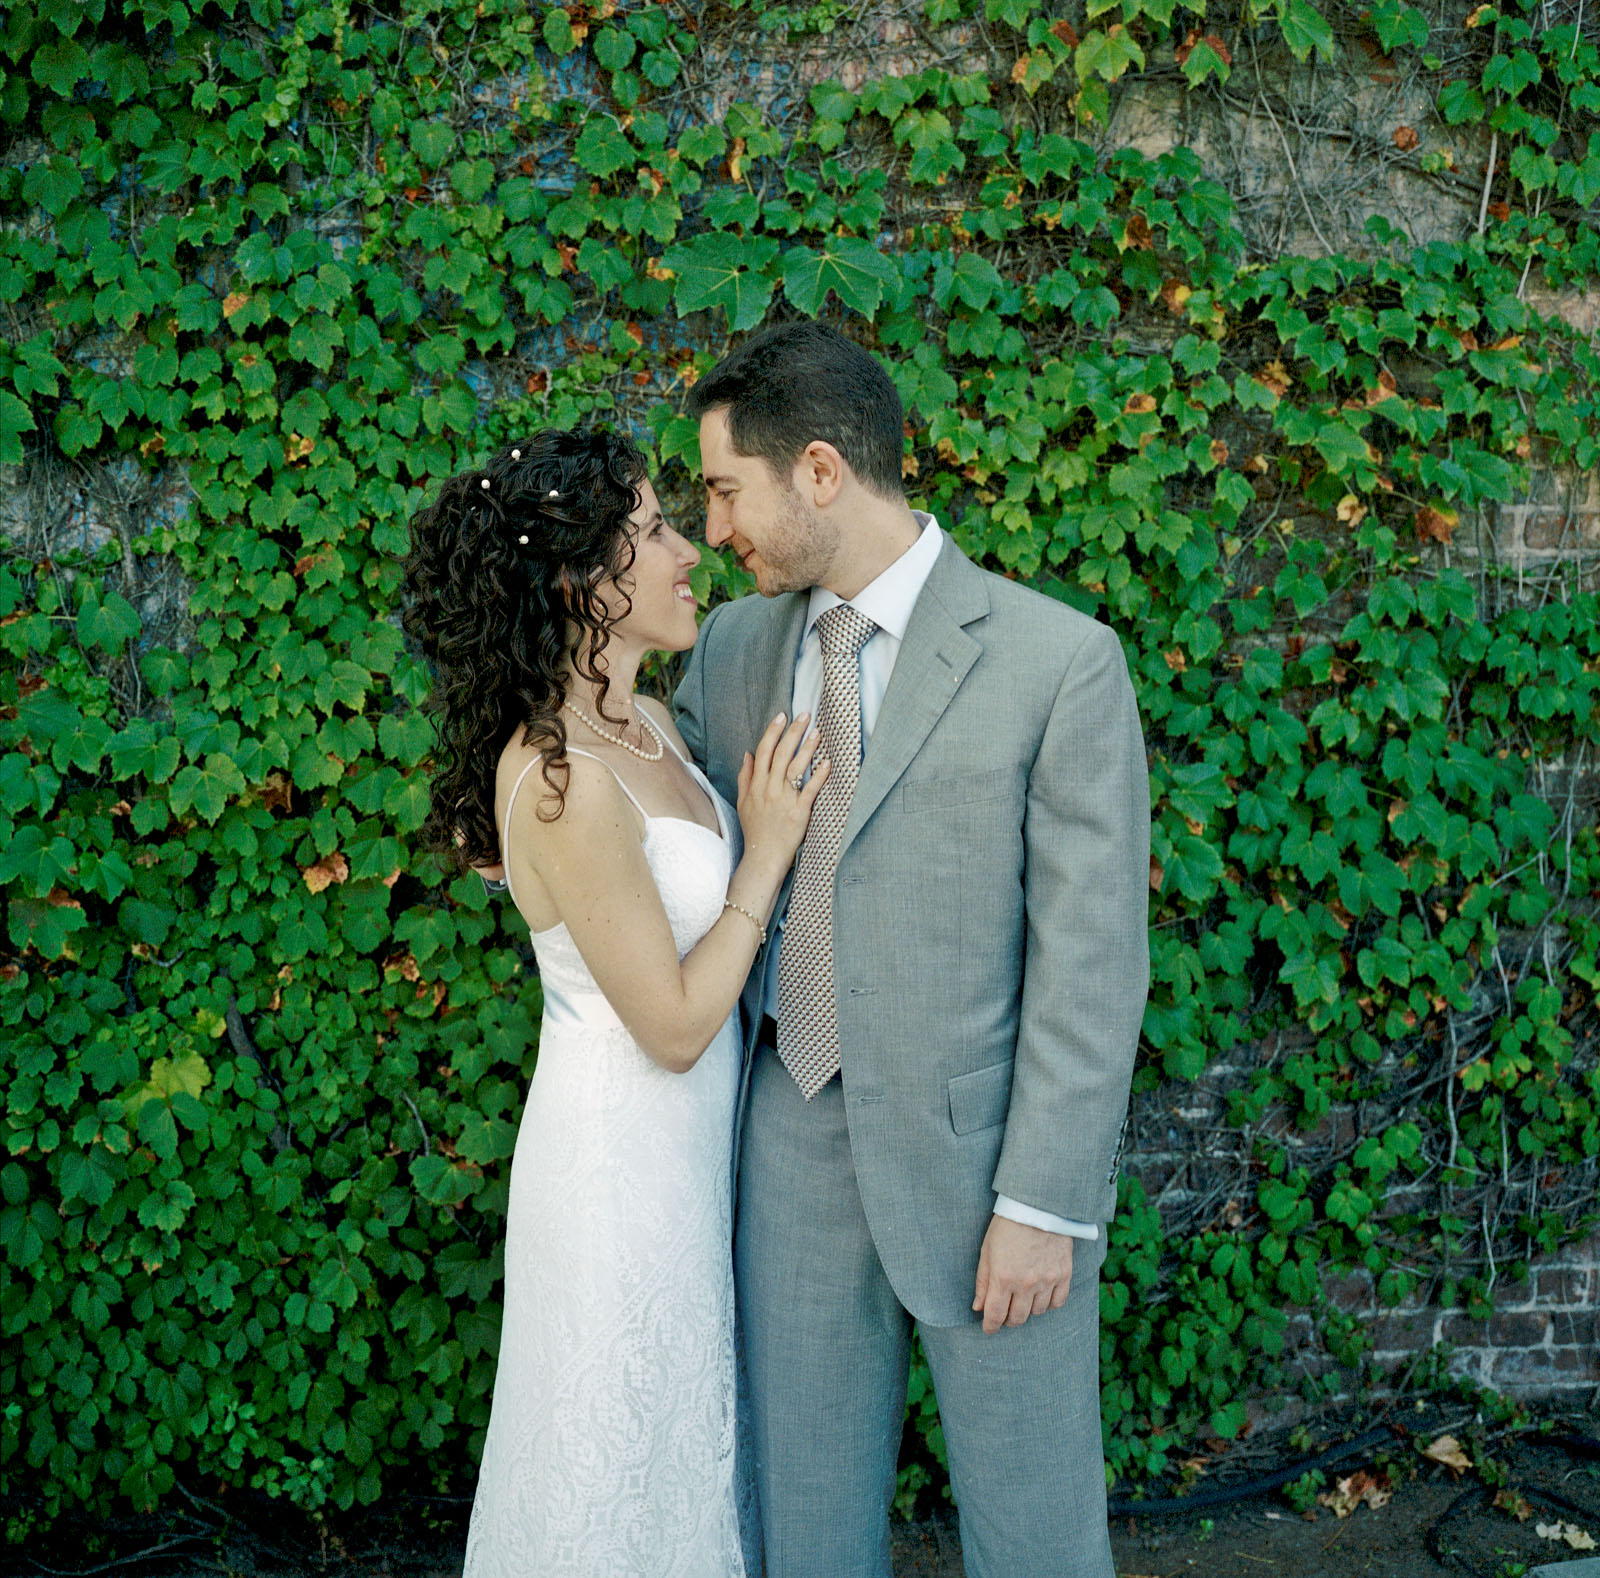 Wedding010_0035_Erik_Joanna_Portraits.jpg